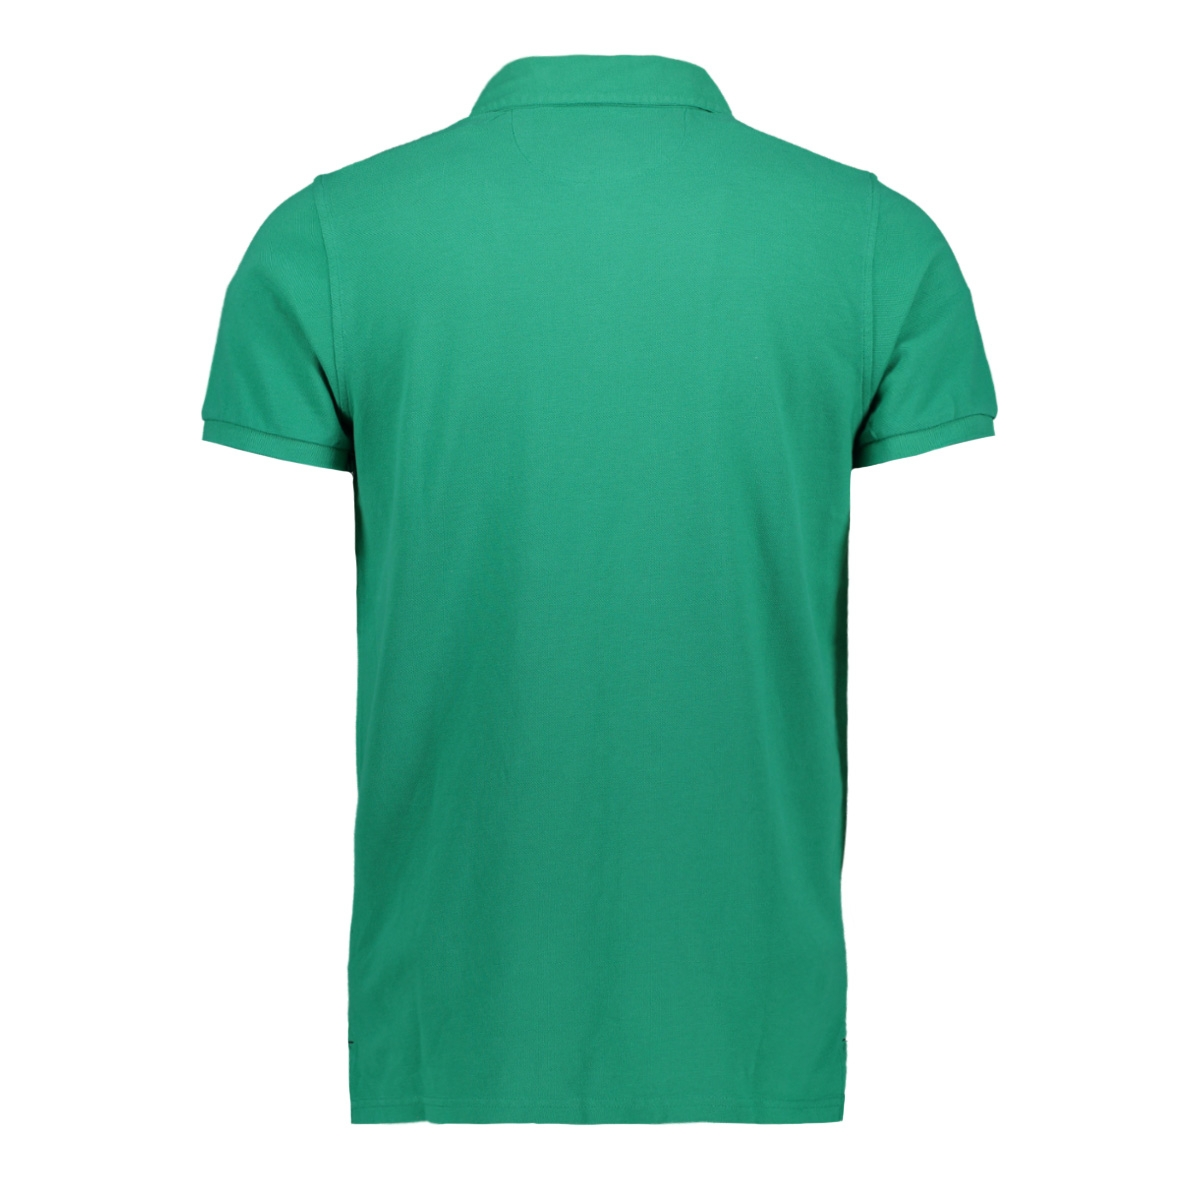 waiapu 20cn150 n.z.a. polo 493 new green